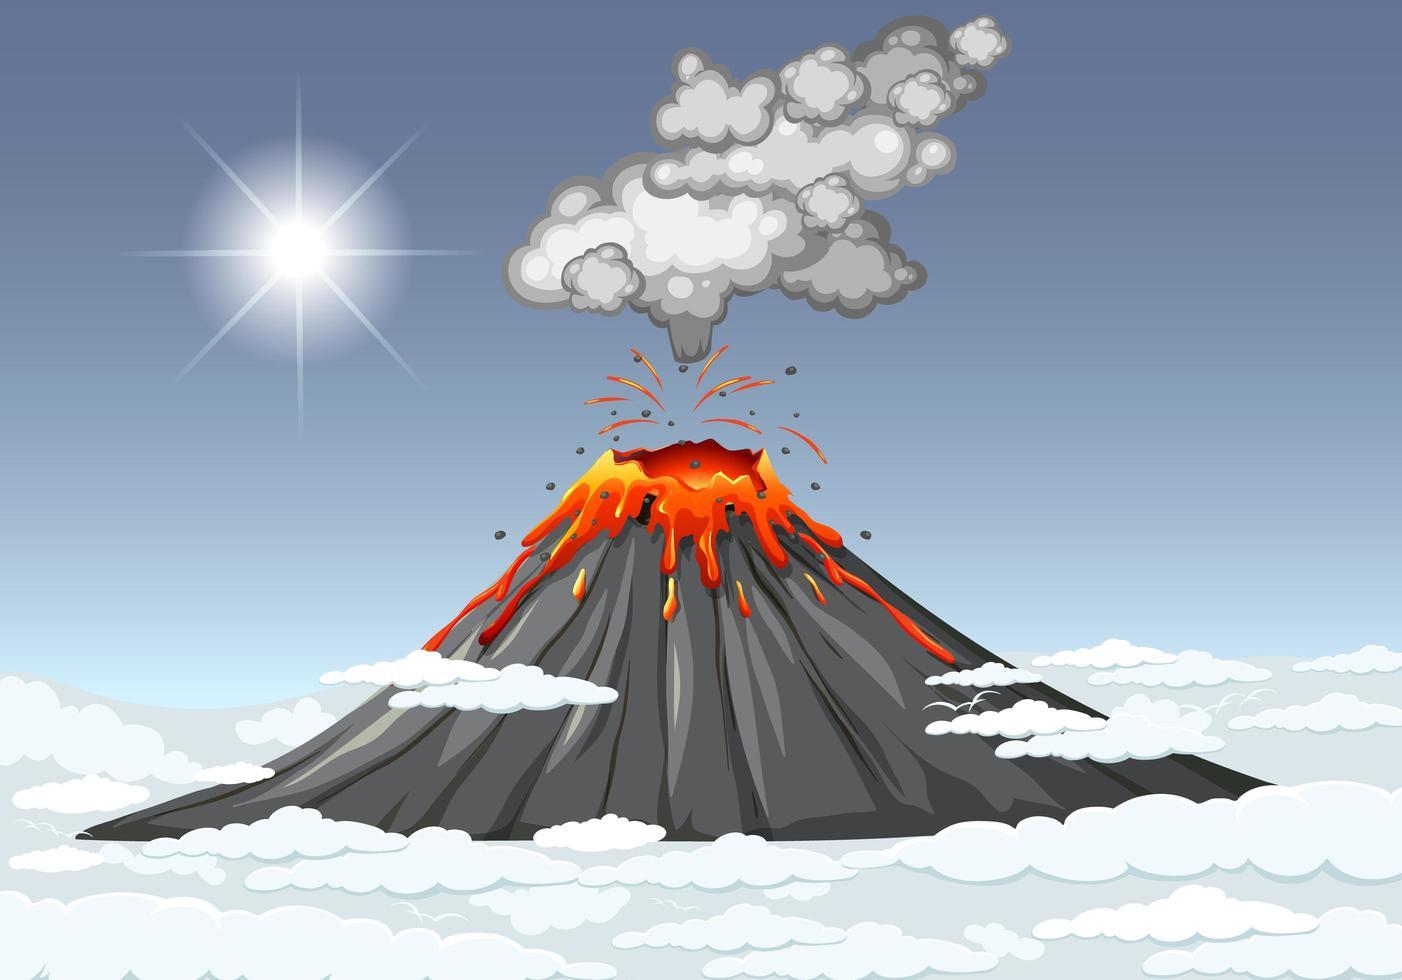 Vulkanausbruch am Himmel mit Wolken vektor